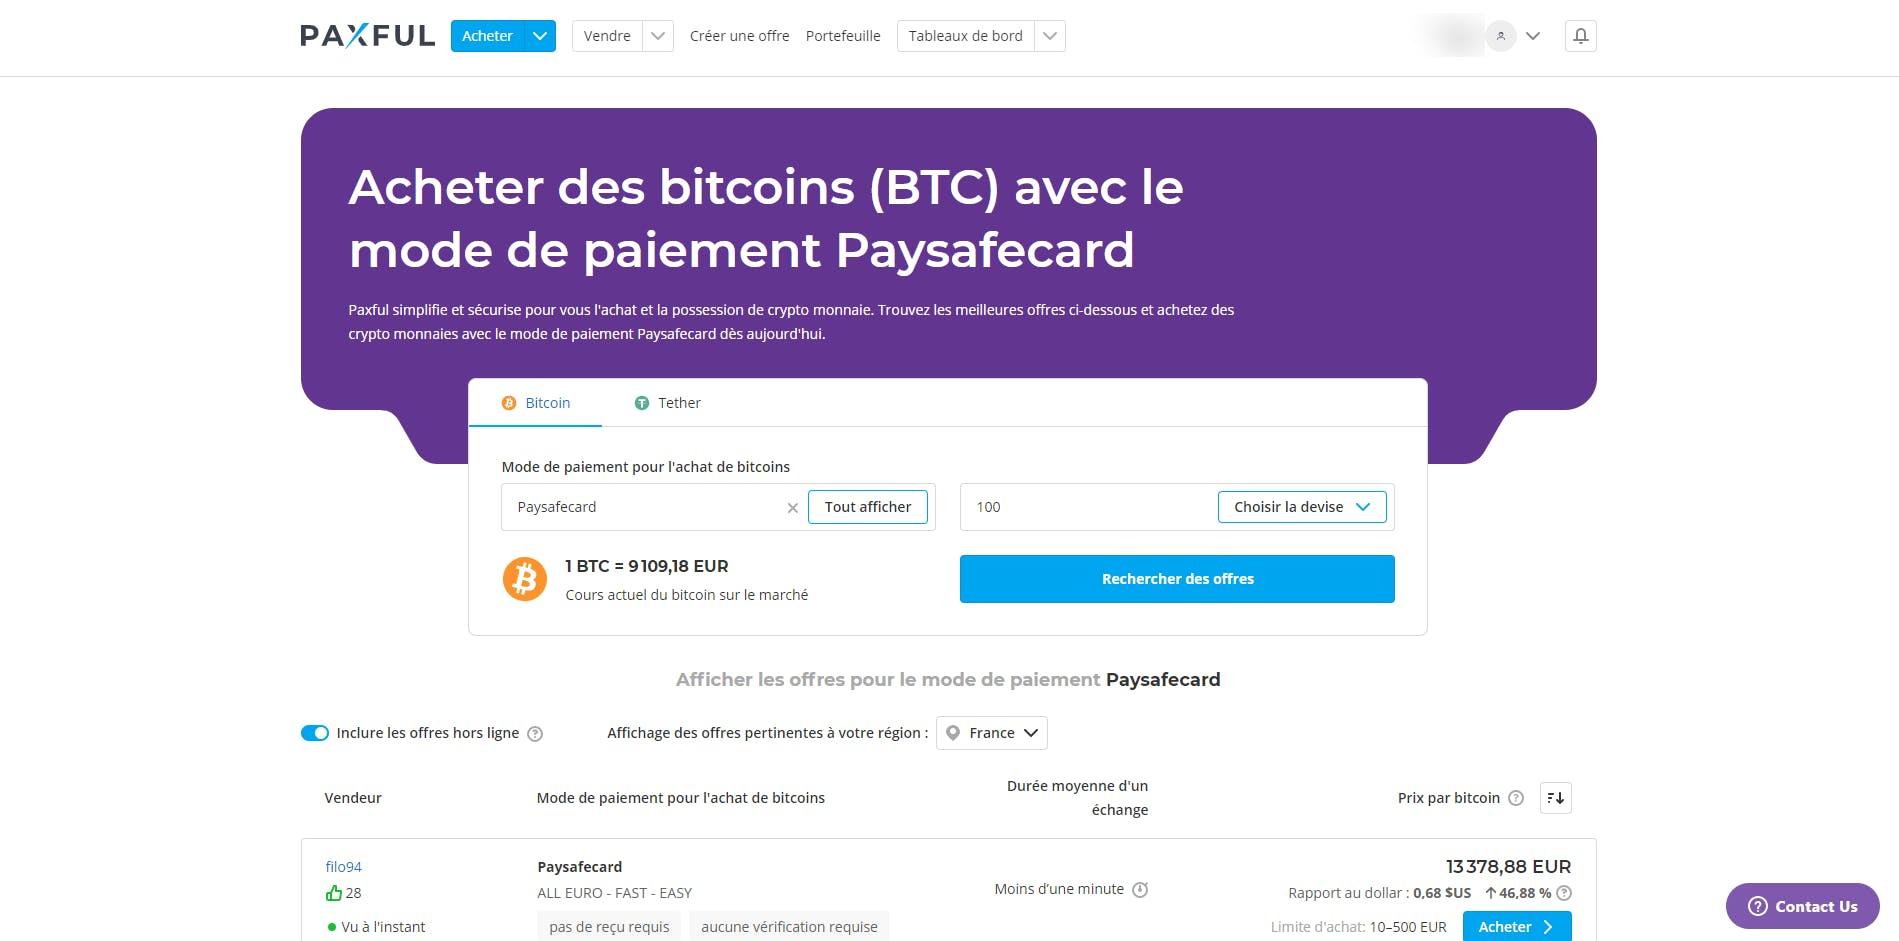 acheter des bitcoins avec paysafecard prepaid